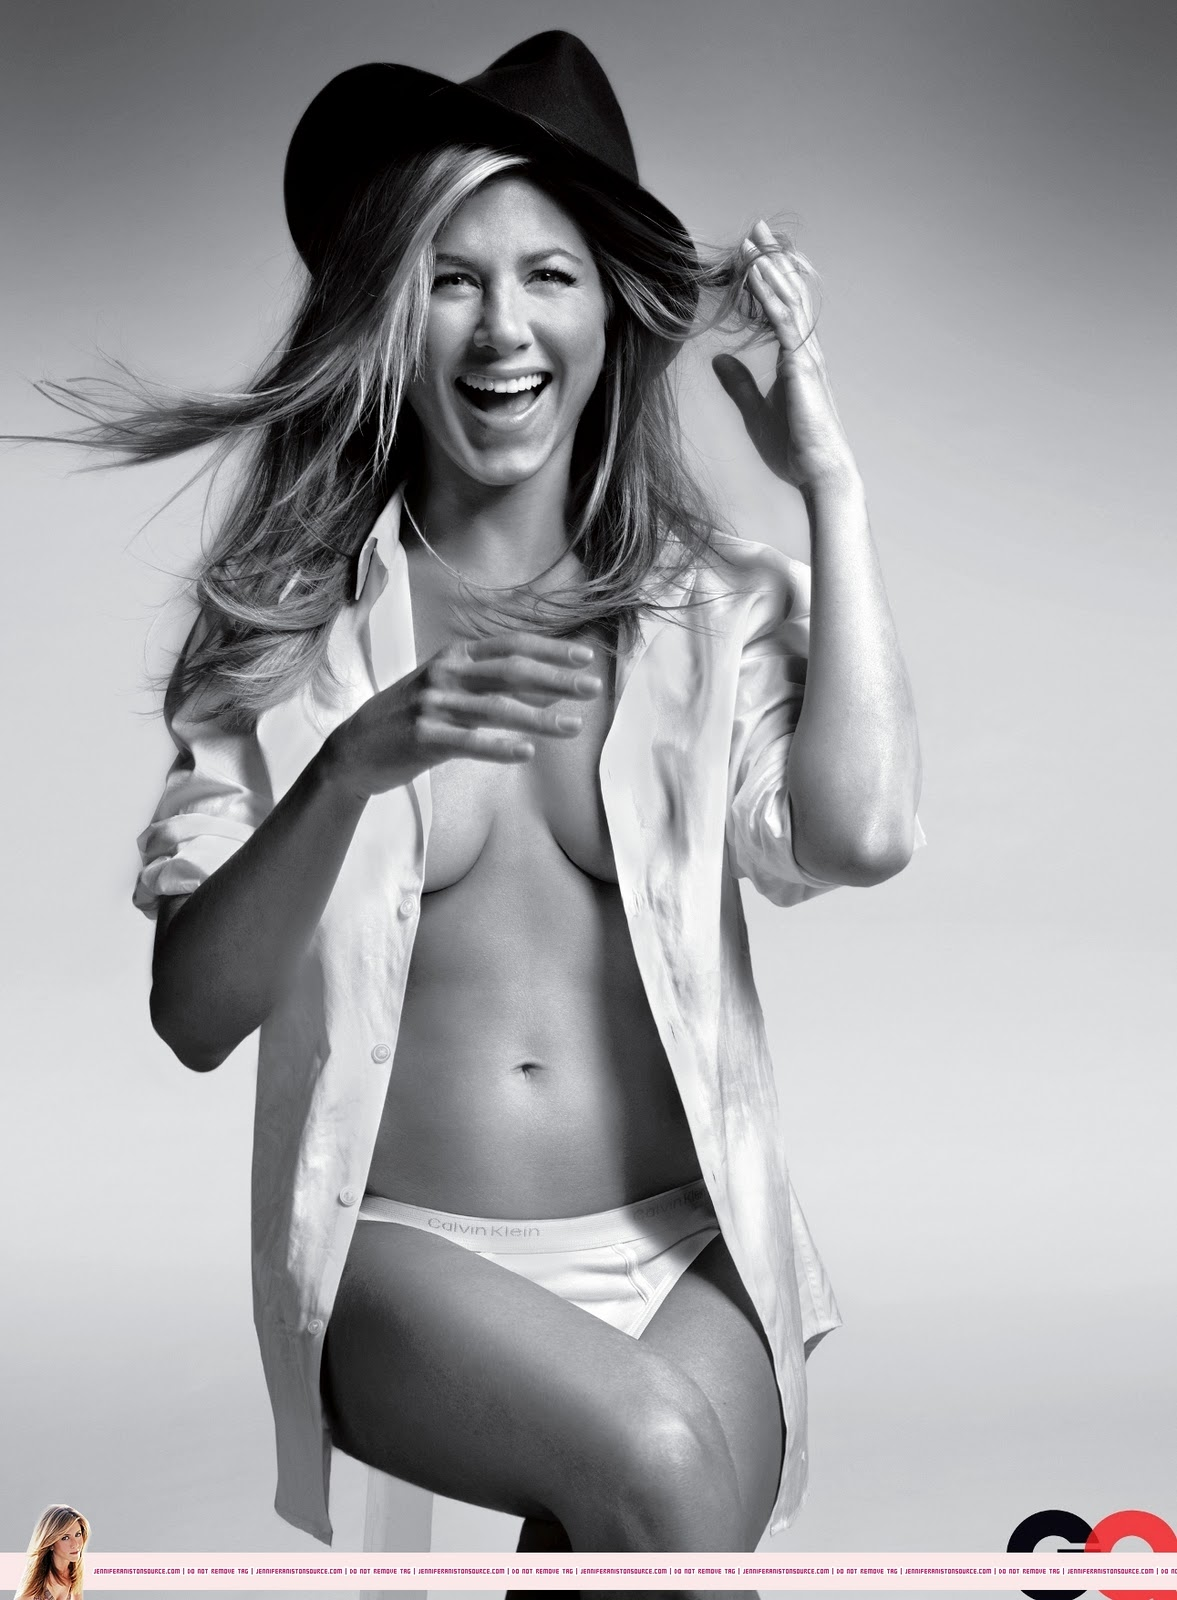 http://3.bp.blogspot.com/-VGUW5oU7ojo/TnVT1mrcRiI/AAAAAAAAHtw/qDwWqcrhAlI/s1600/Jennifer+Aniston+topless+para+GQ.jpg